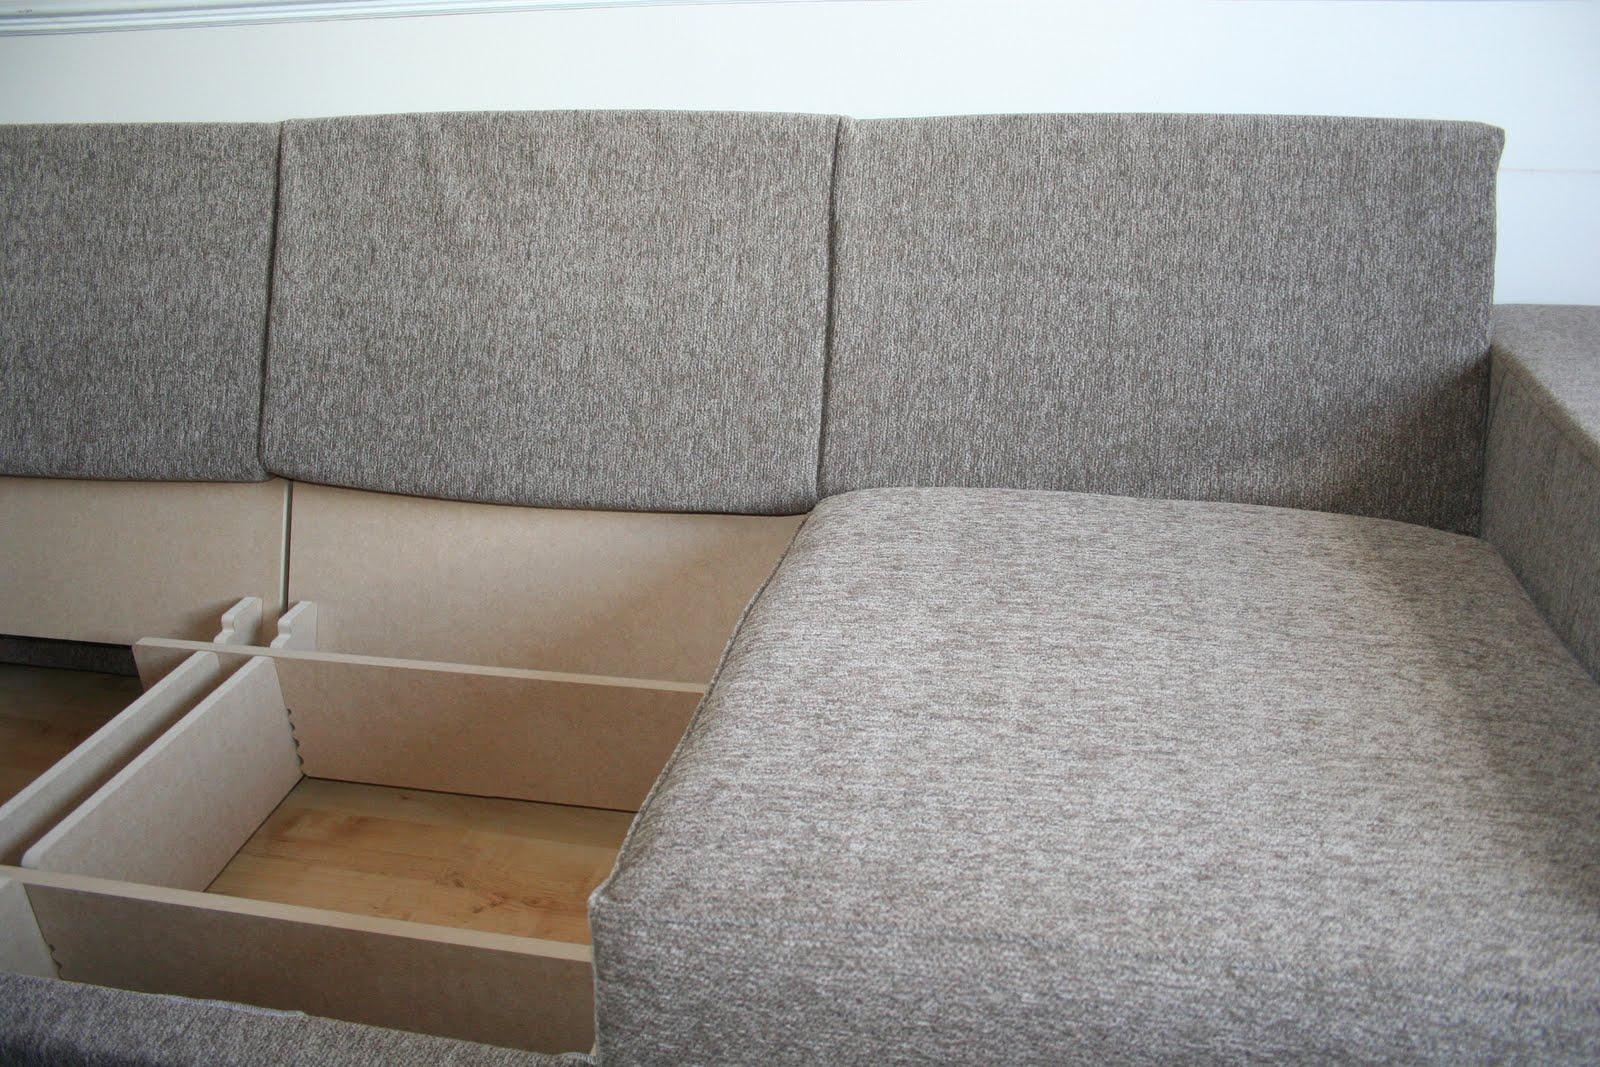 Modular Sofa With Storage Sofa Bed Design Modular With